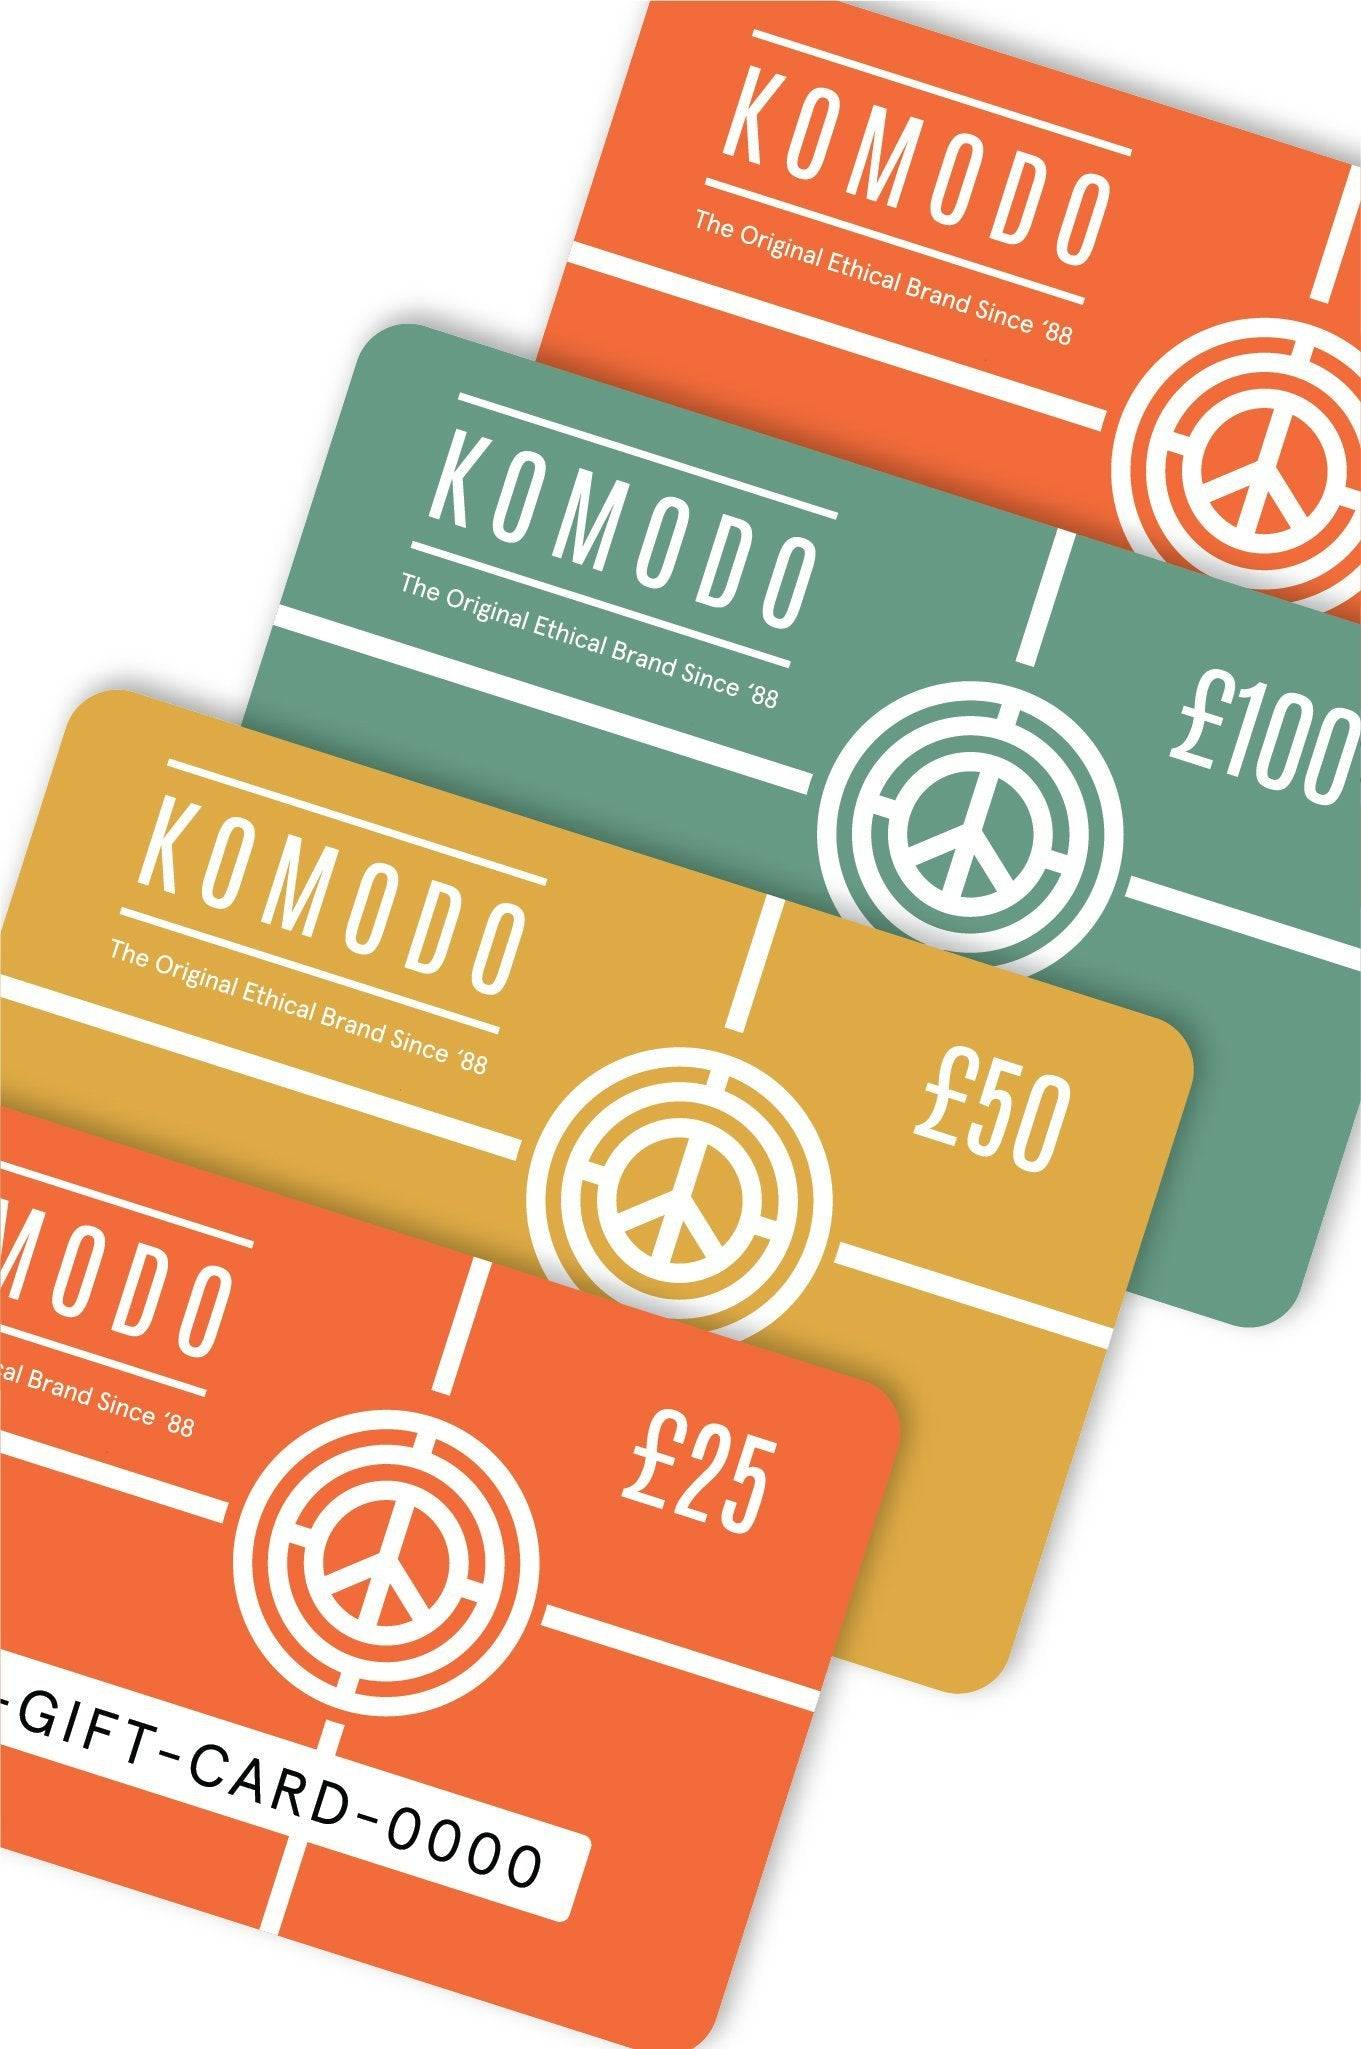 Komodo Gift Cards, £50.00